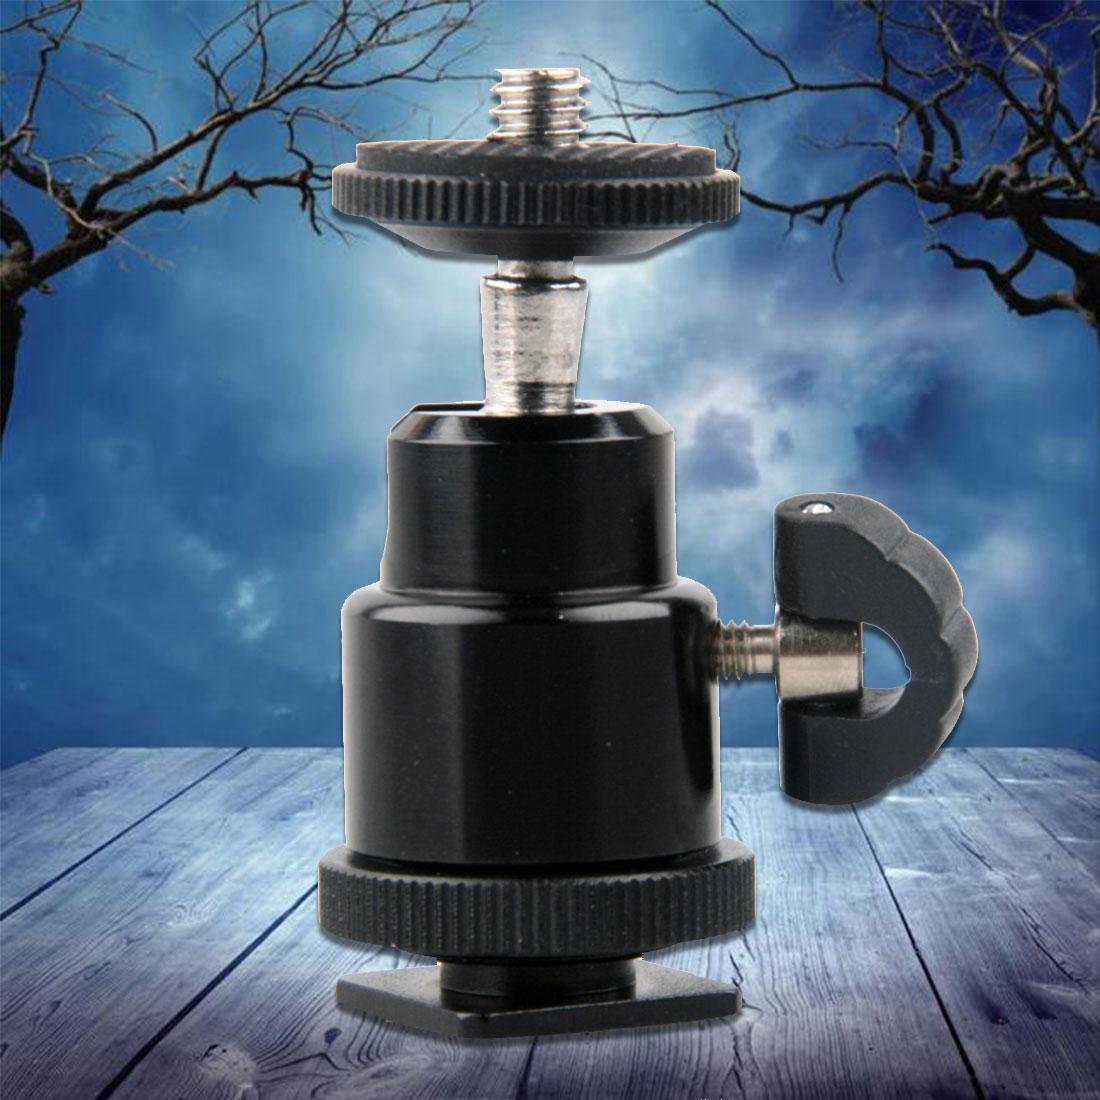 Centechia New For Camera font b Tripod b font LED Light Flash Bracket Holder Mount 1